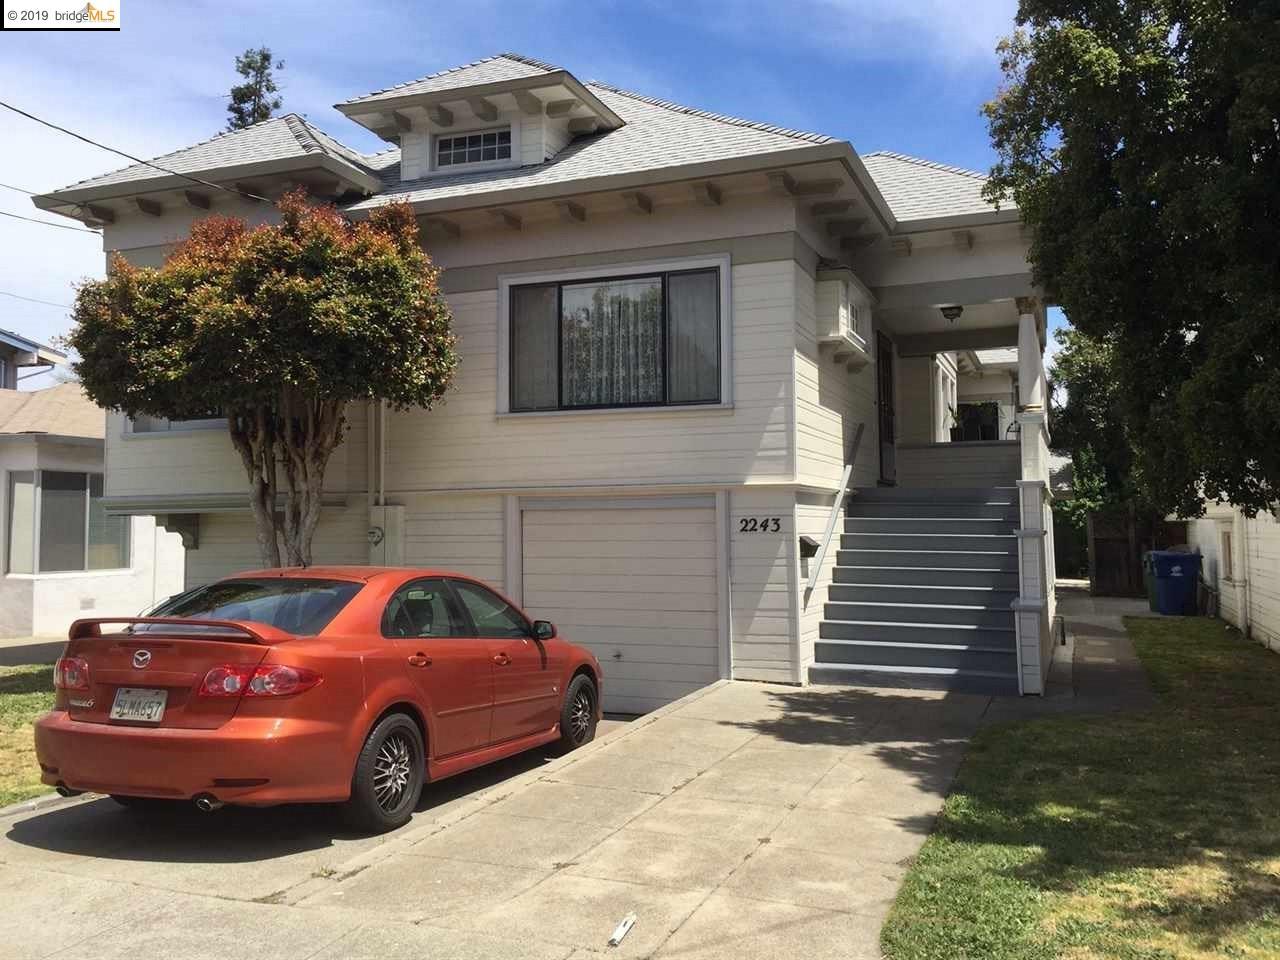 2243 Buena Vista Avenue Alameda, CA 94501